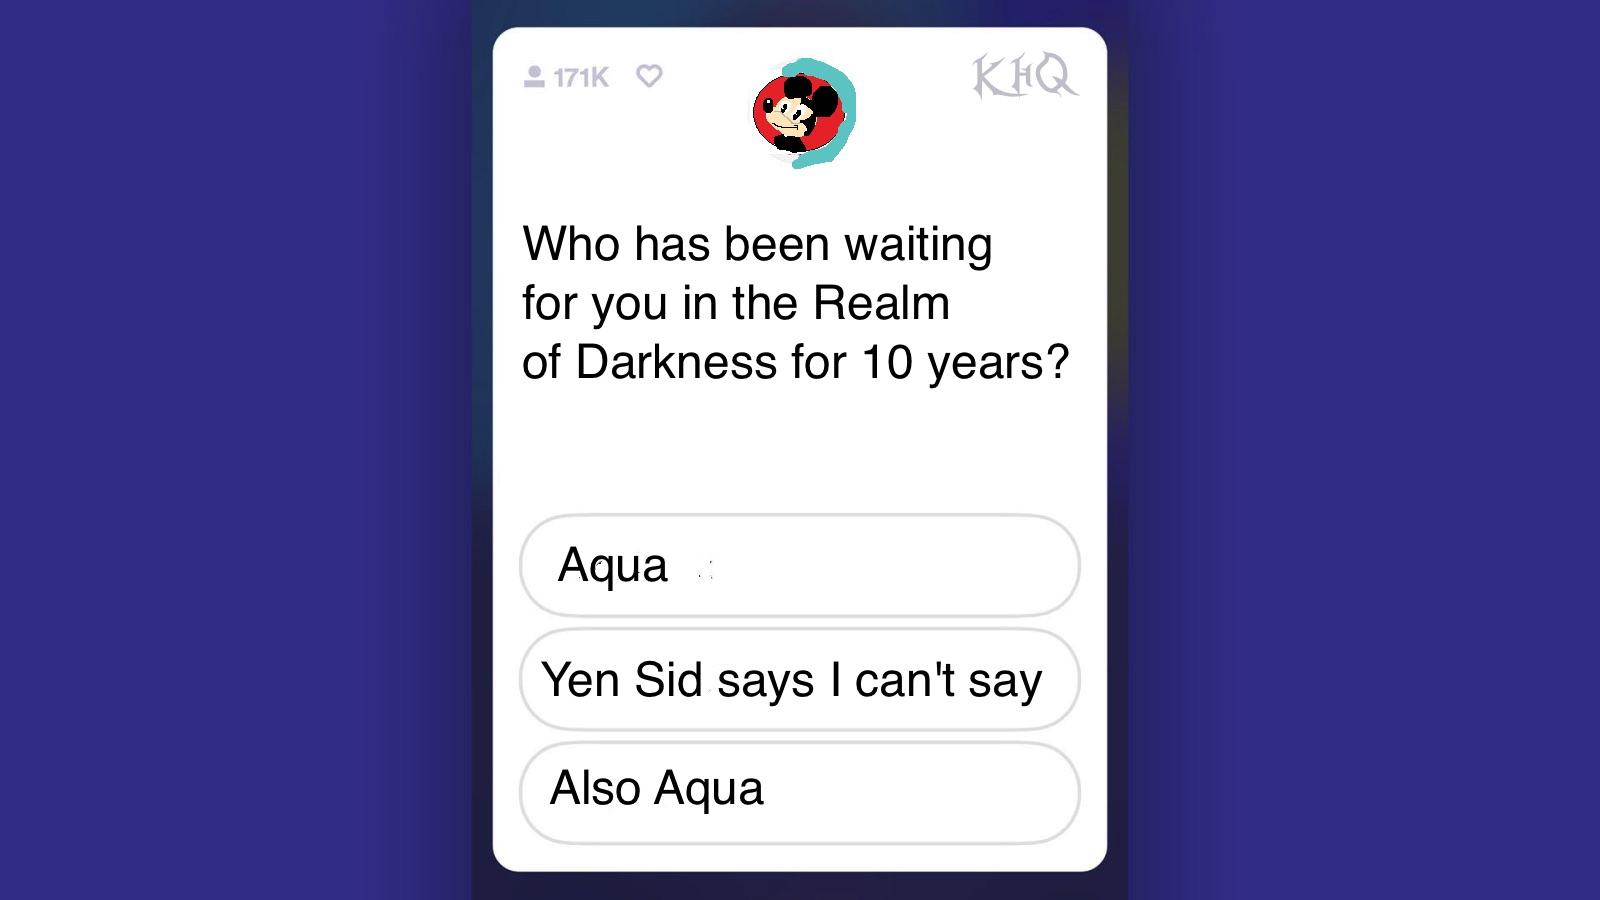 Mickey Mouse Aqua realm of darkness KHQ trivia